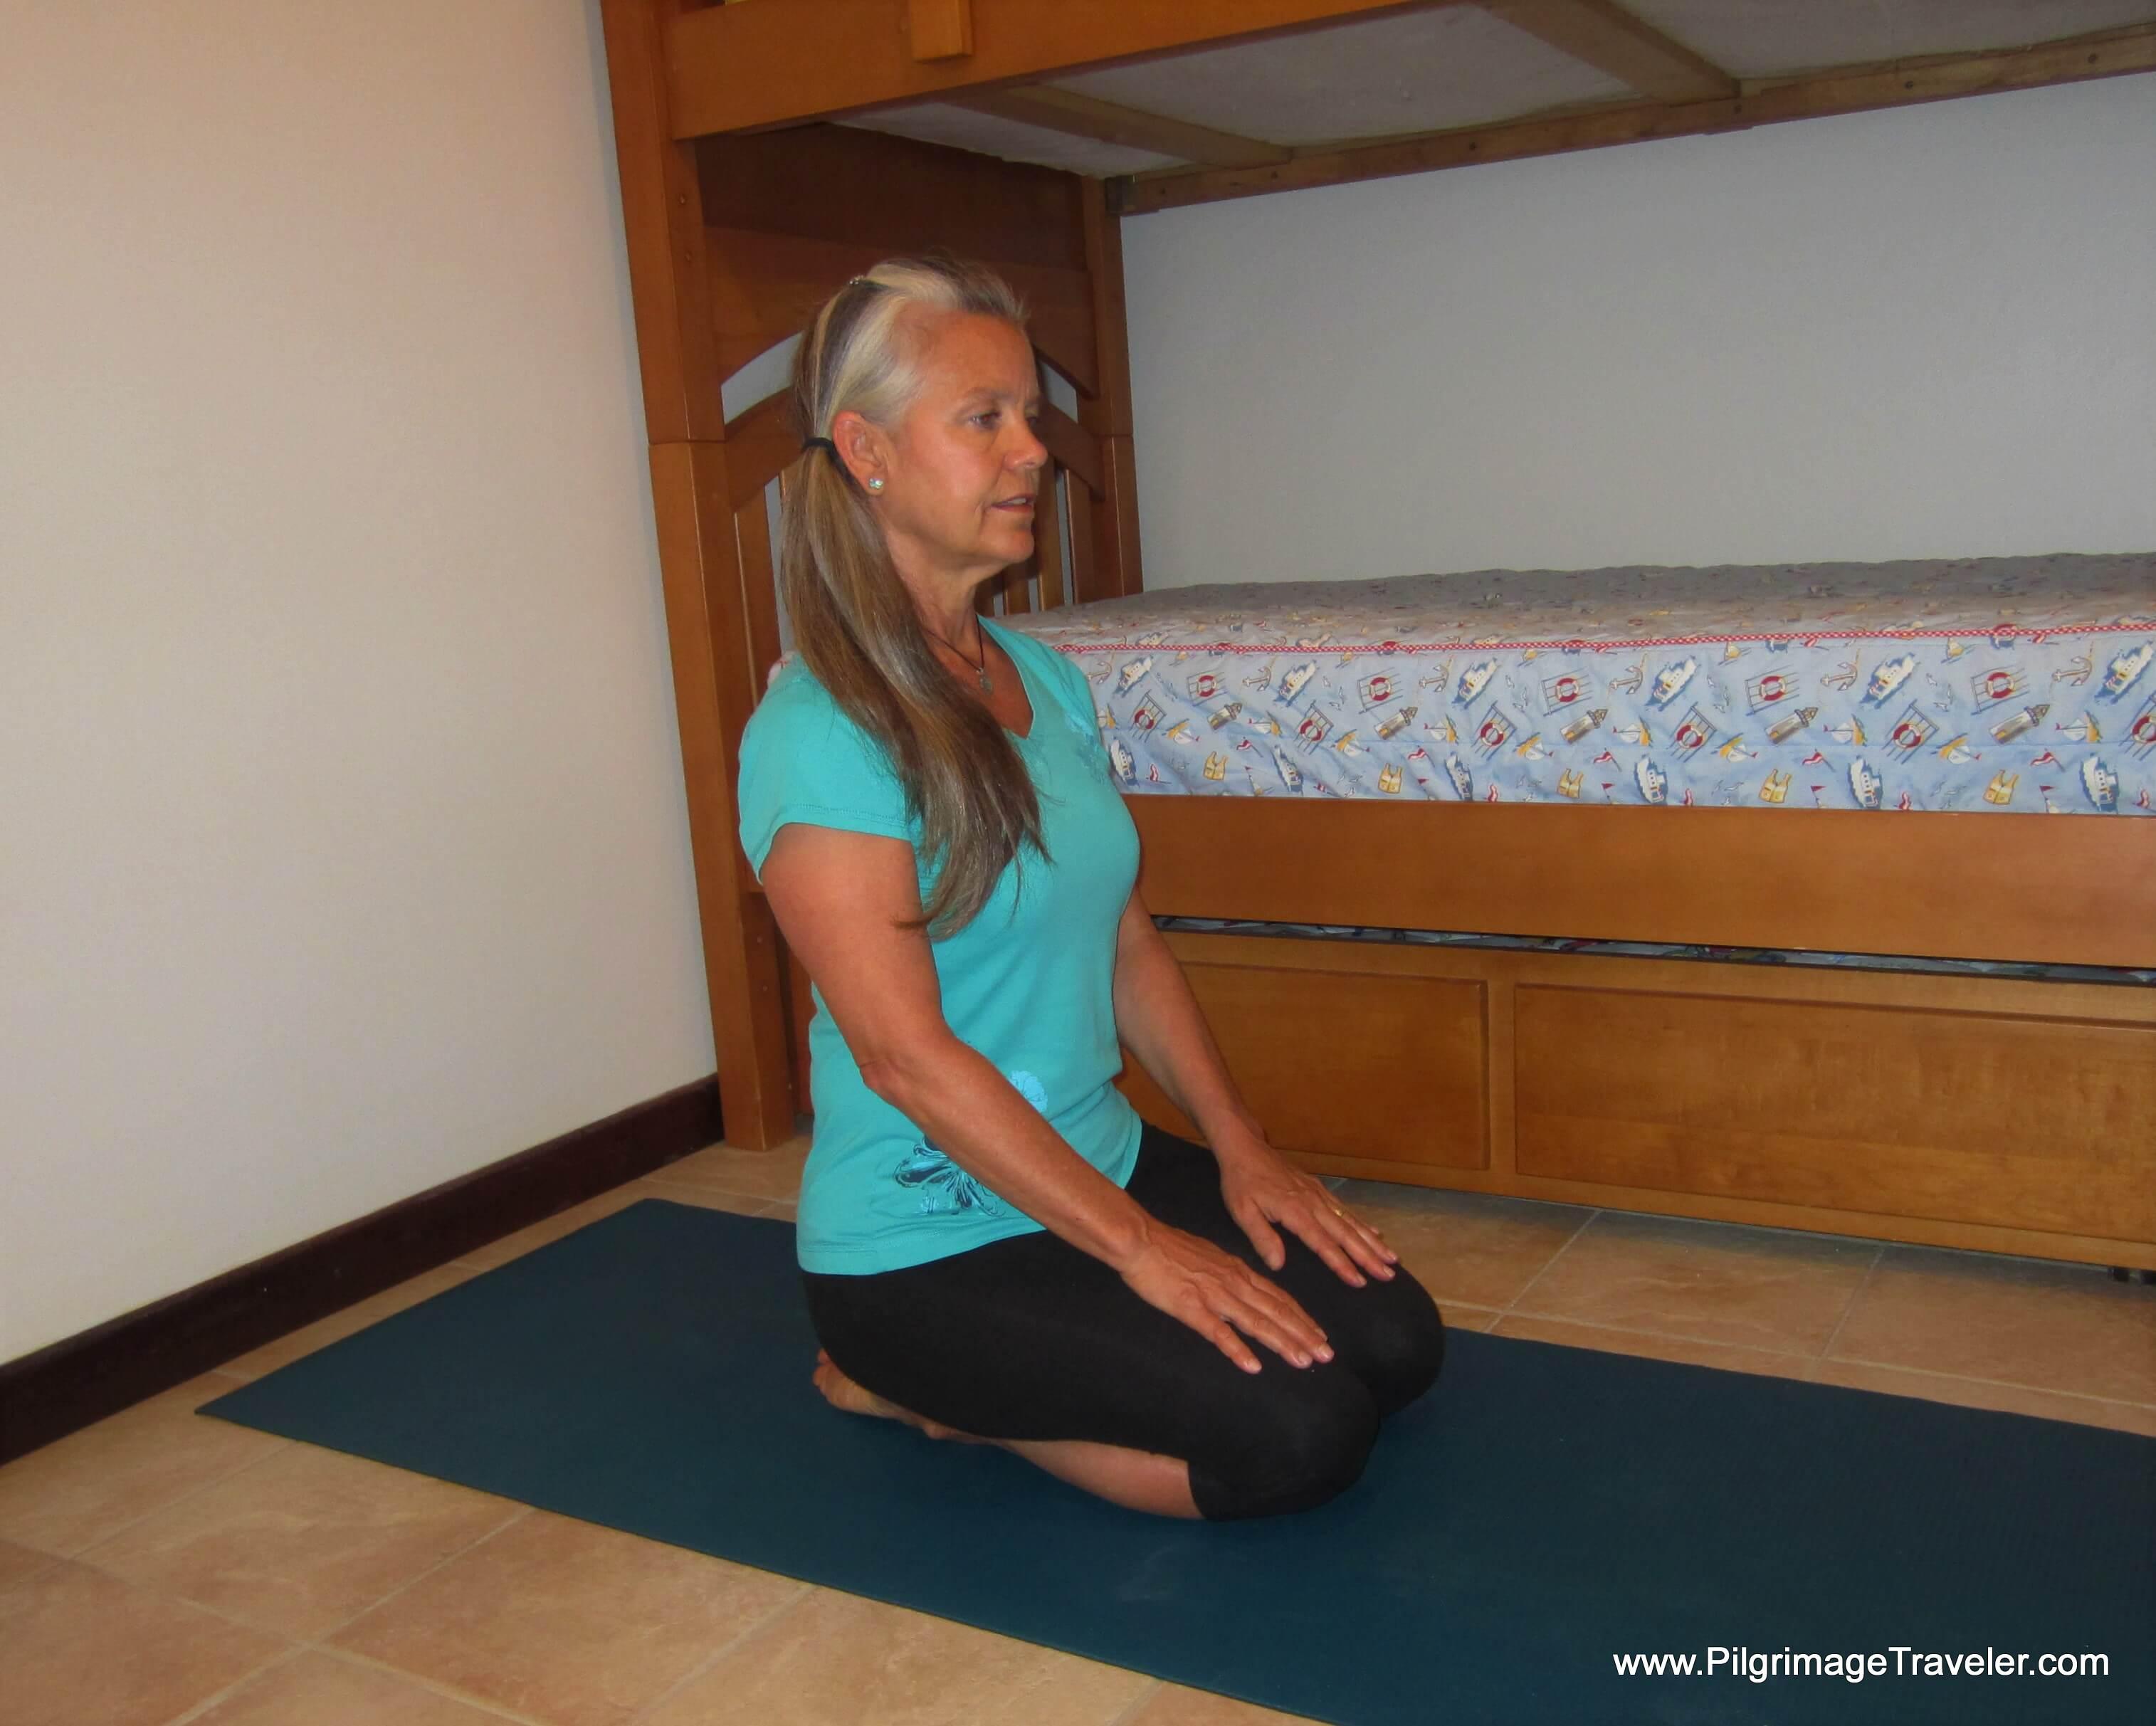 Ankle Plantar Flexion Stretch - Step One